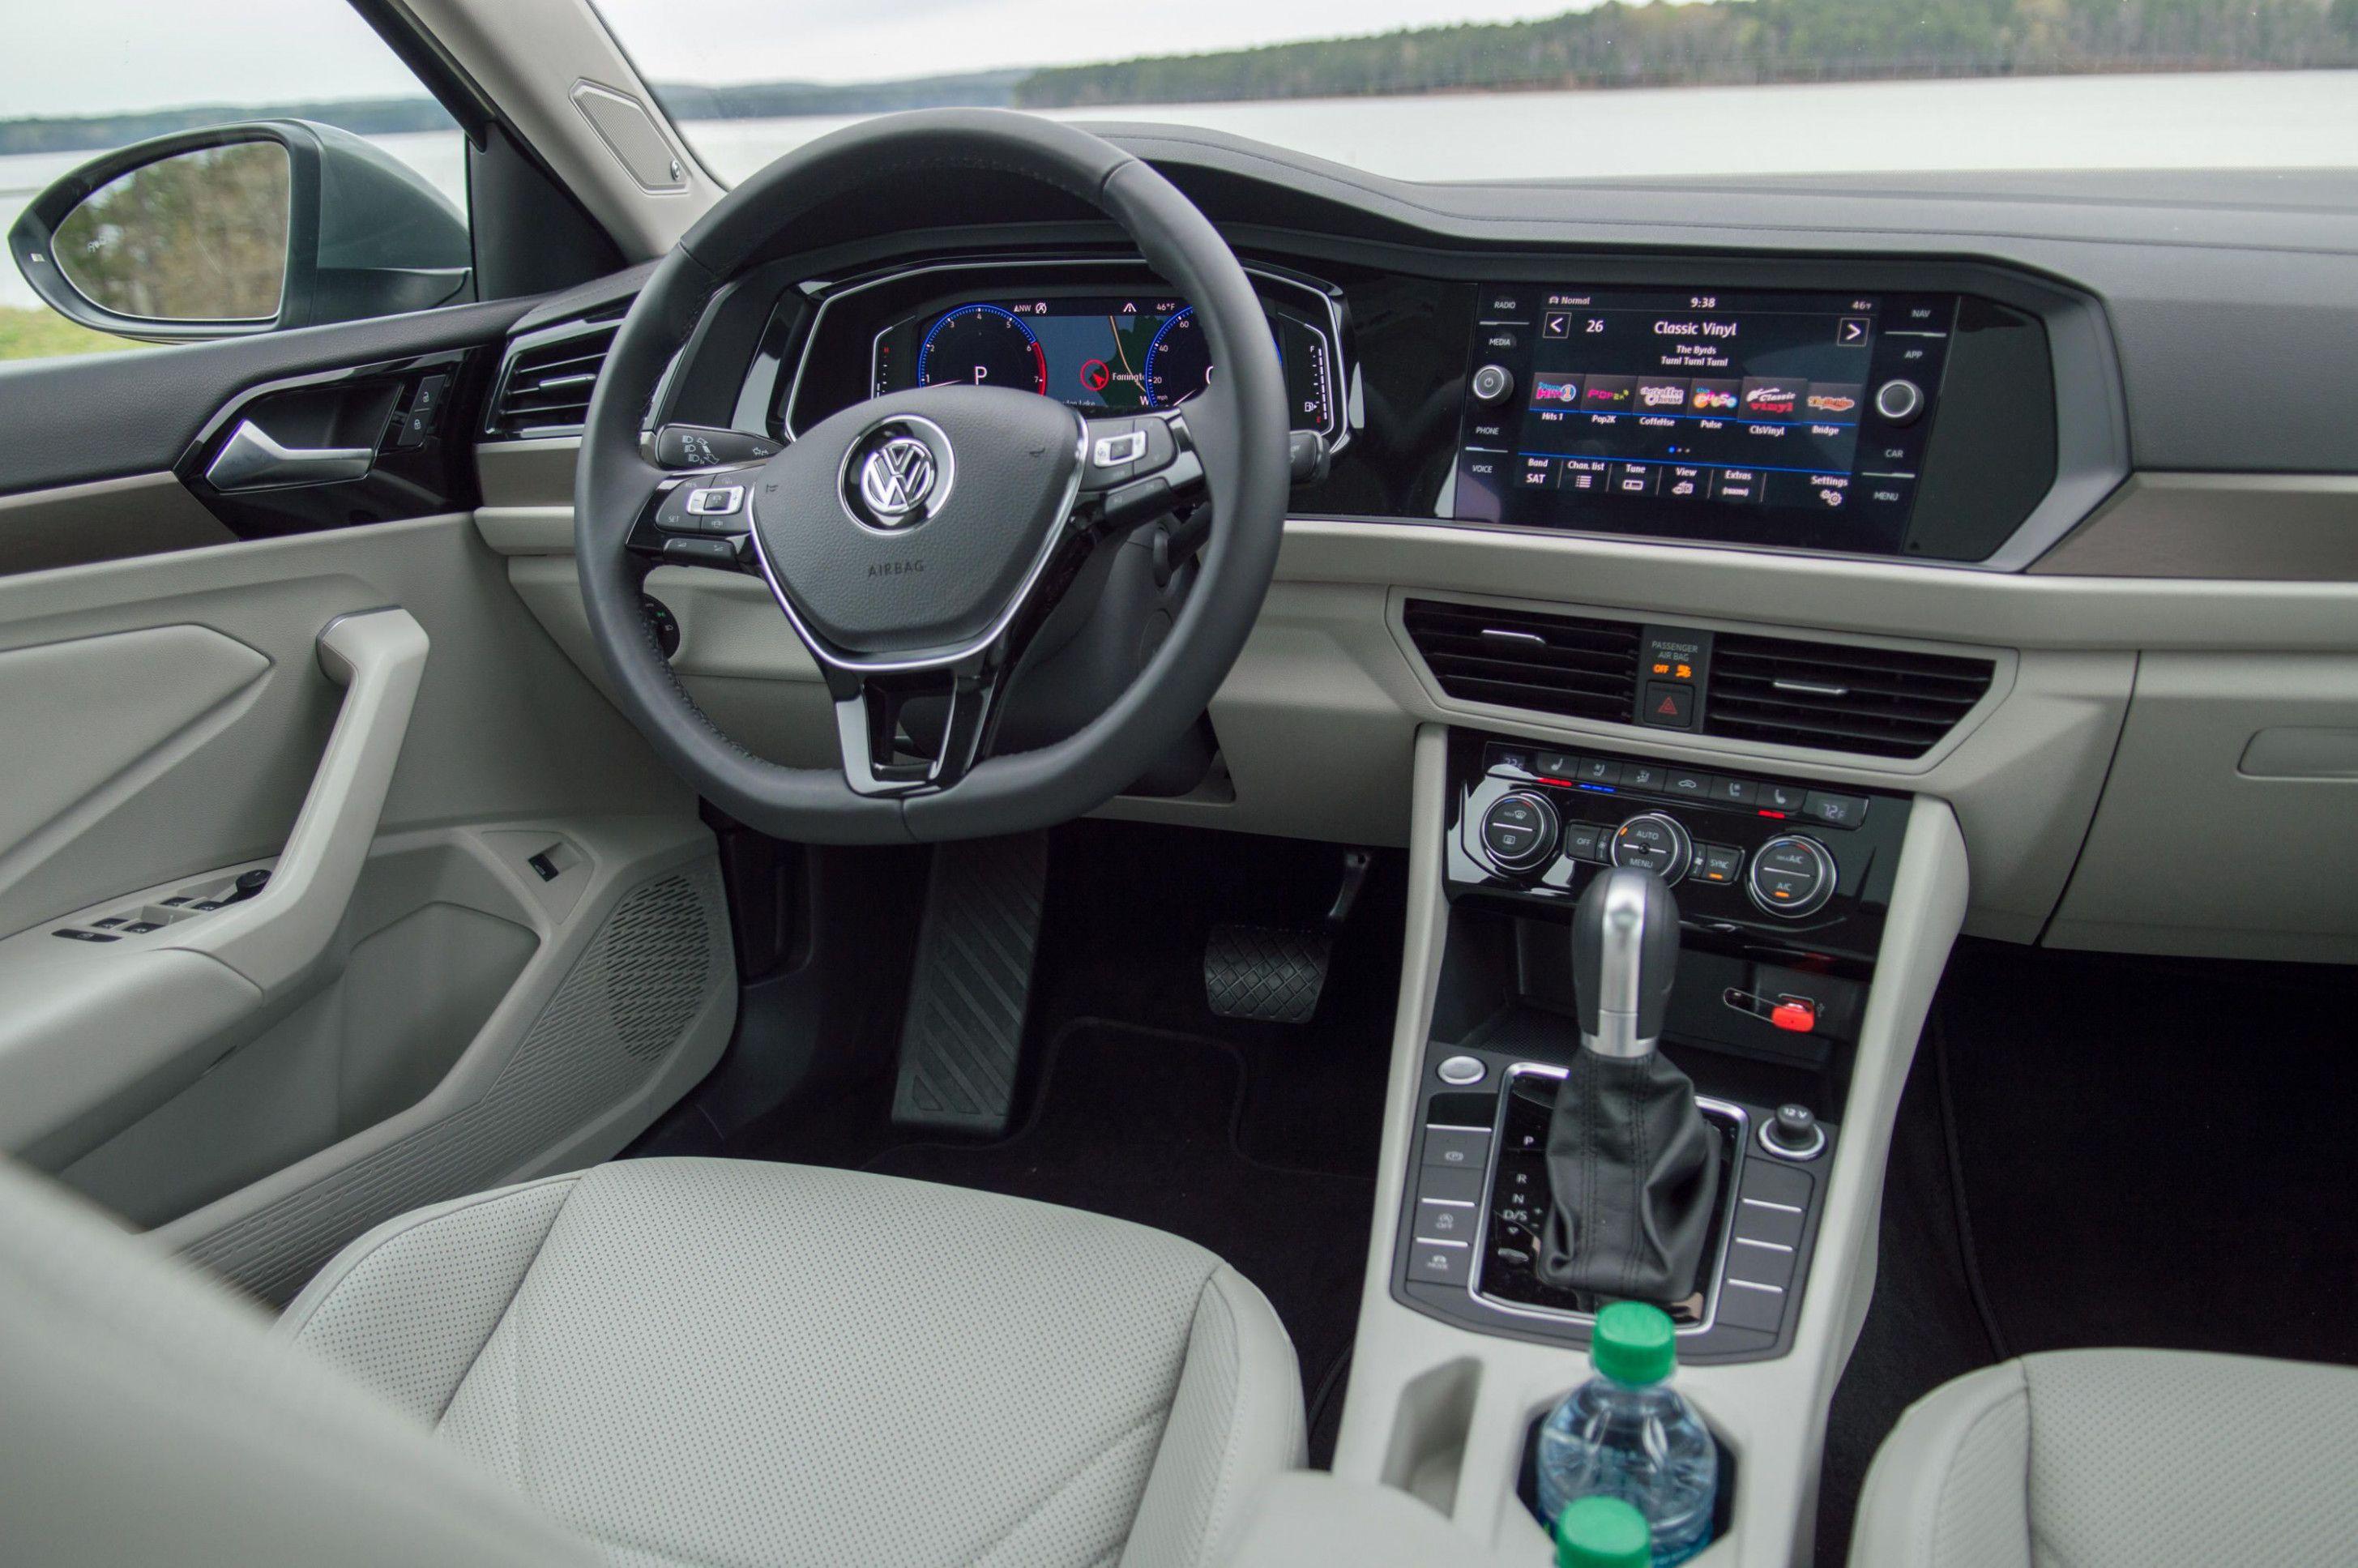 2020 Volkswagen Jetta Interior Prices 2020 Car Reviews Volkswagen Jetta Volkswagen Vw Passat